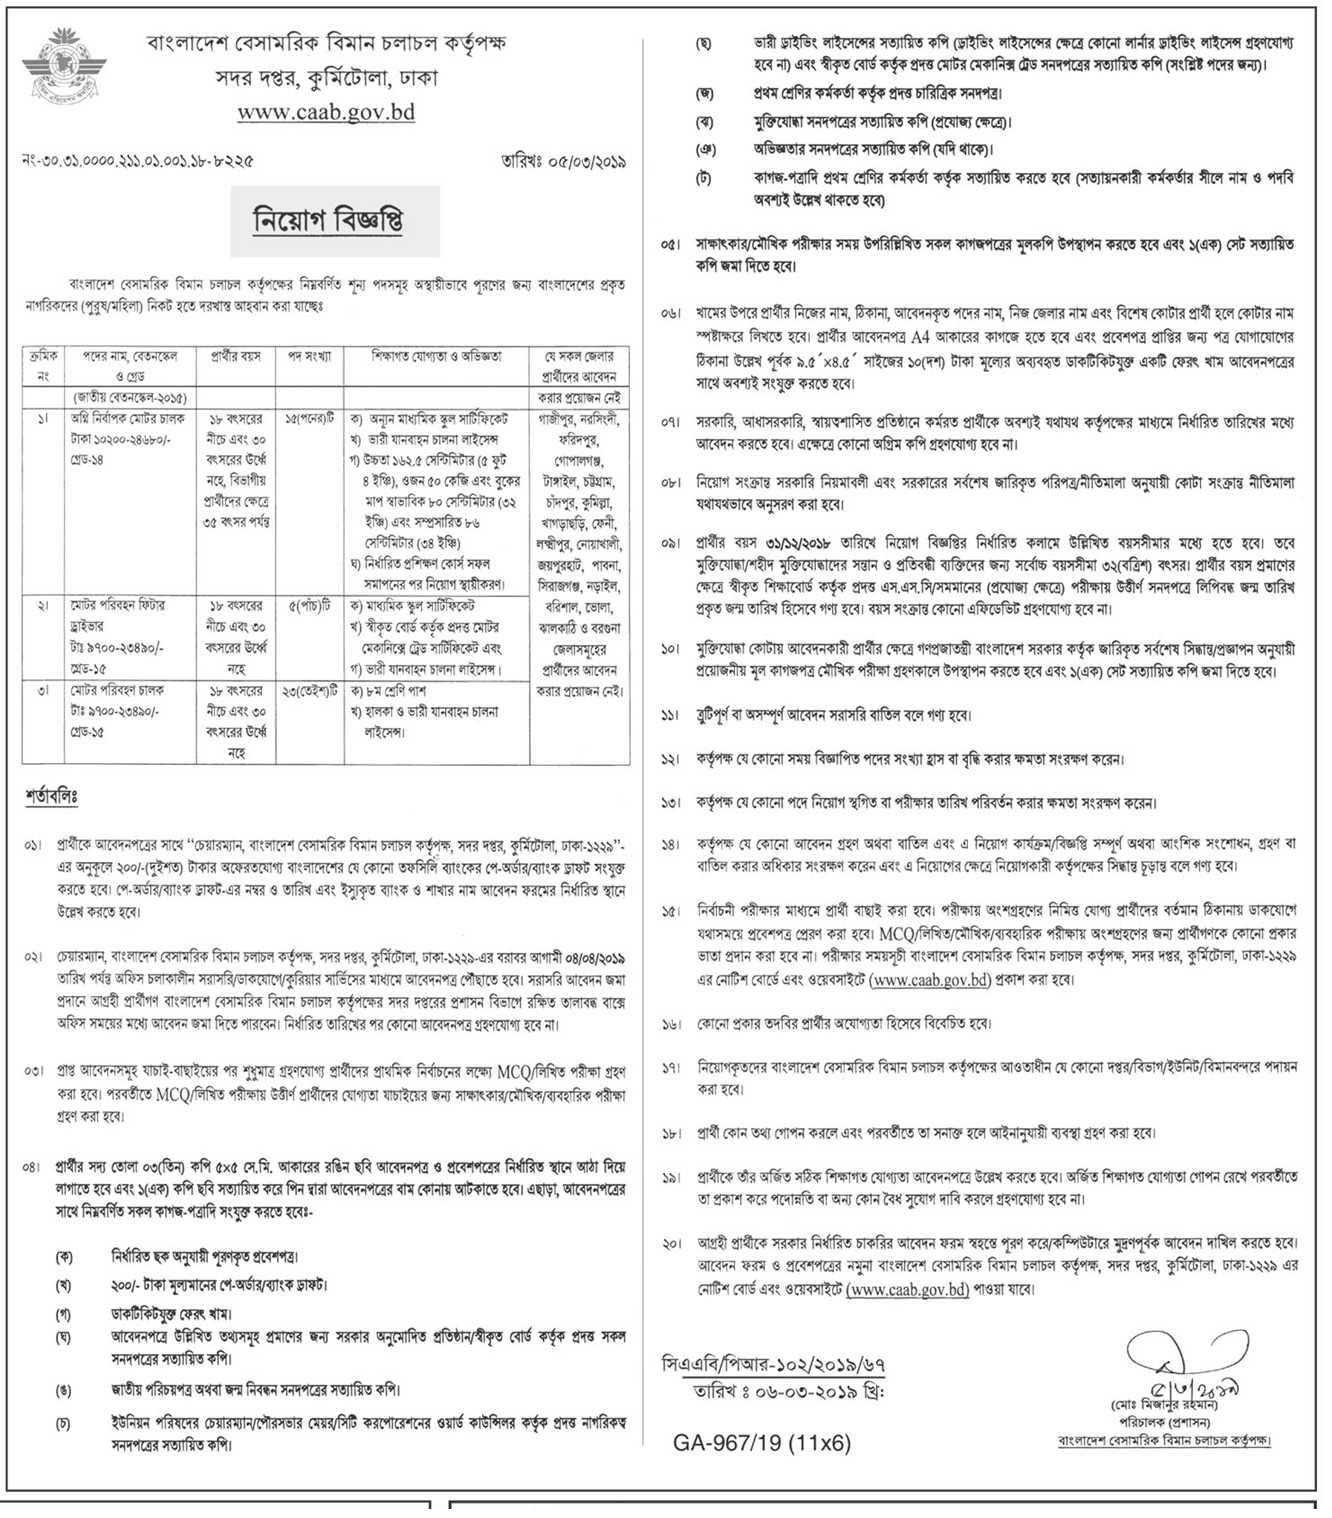 Bangladesh Civil Aviation Authority CAAB Job Circular 2019